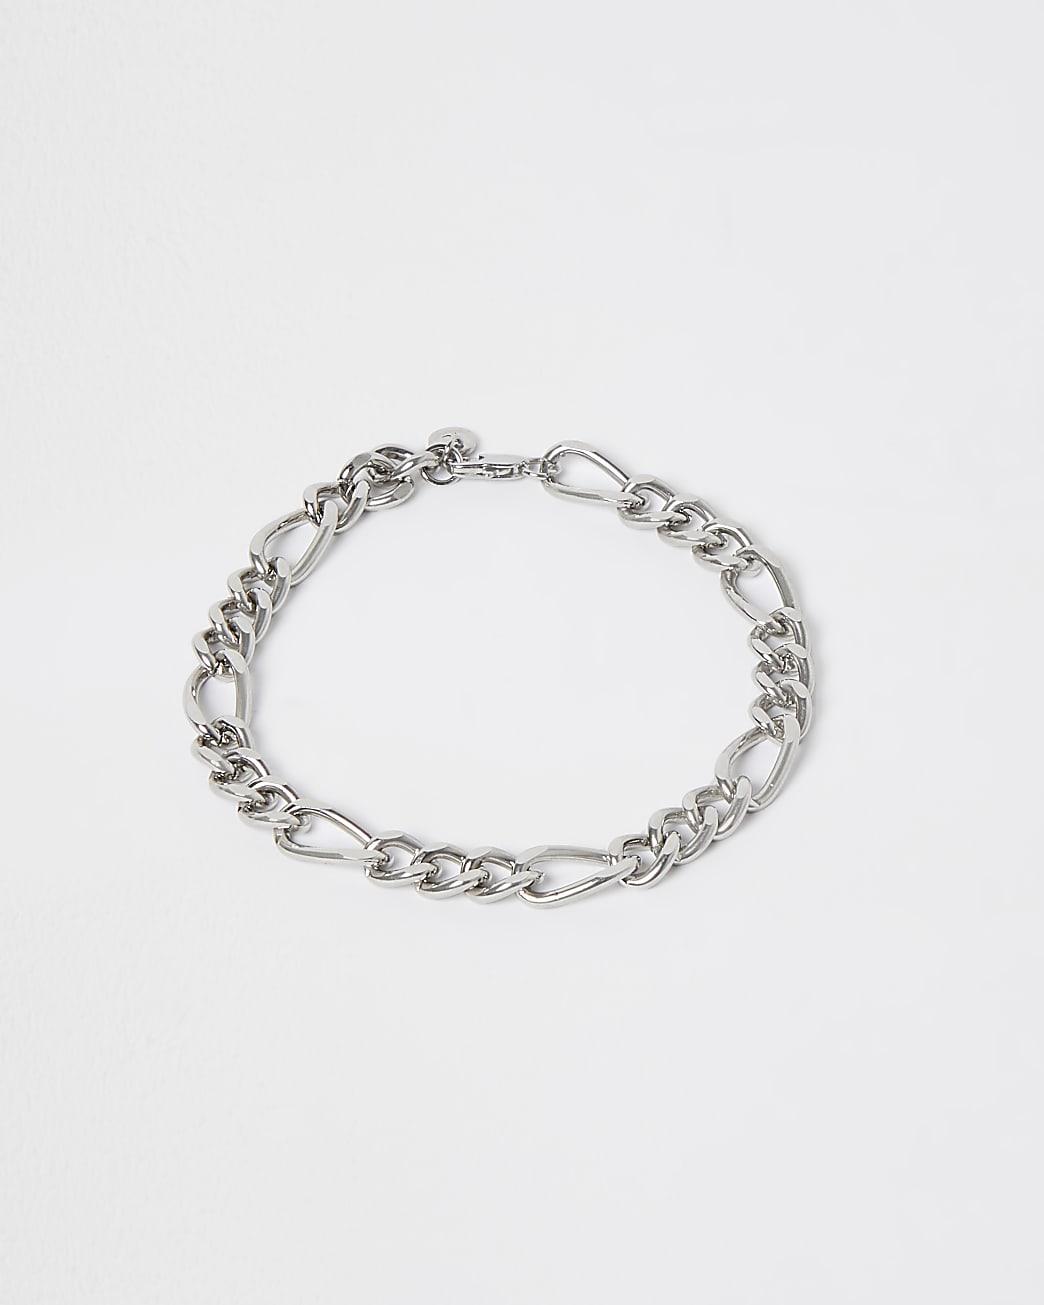 Silver figaro chain bracelet